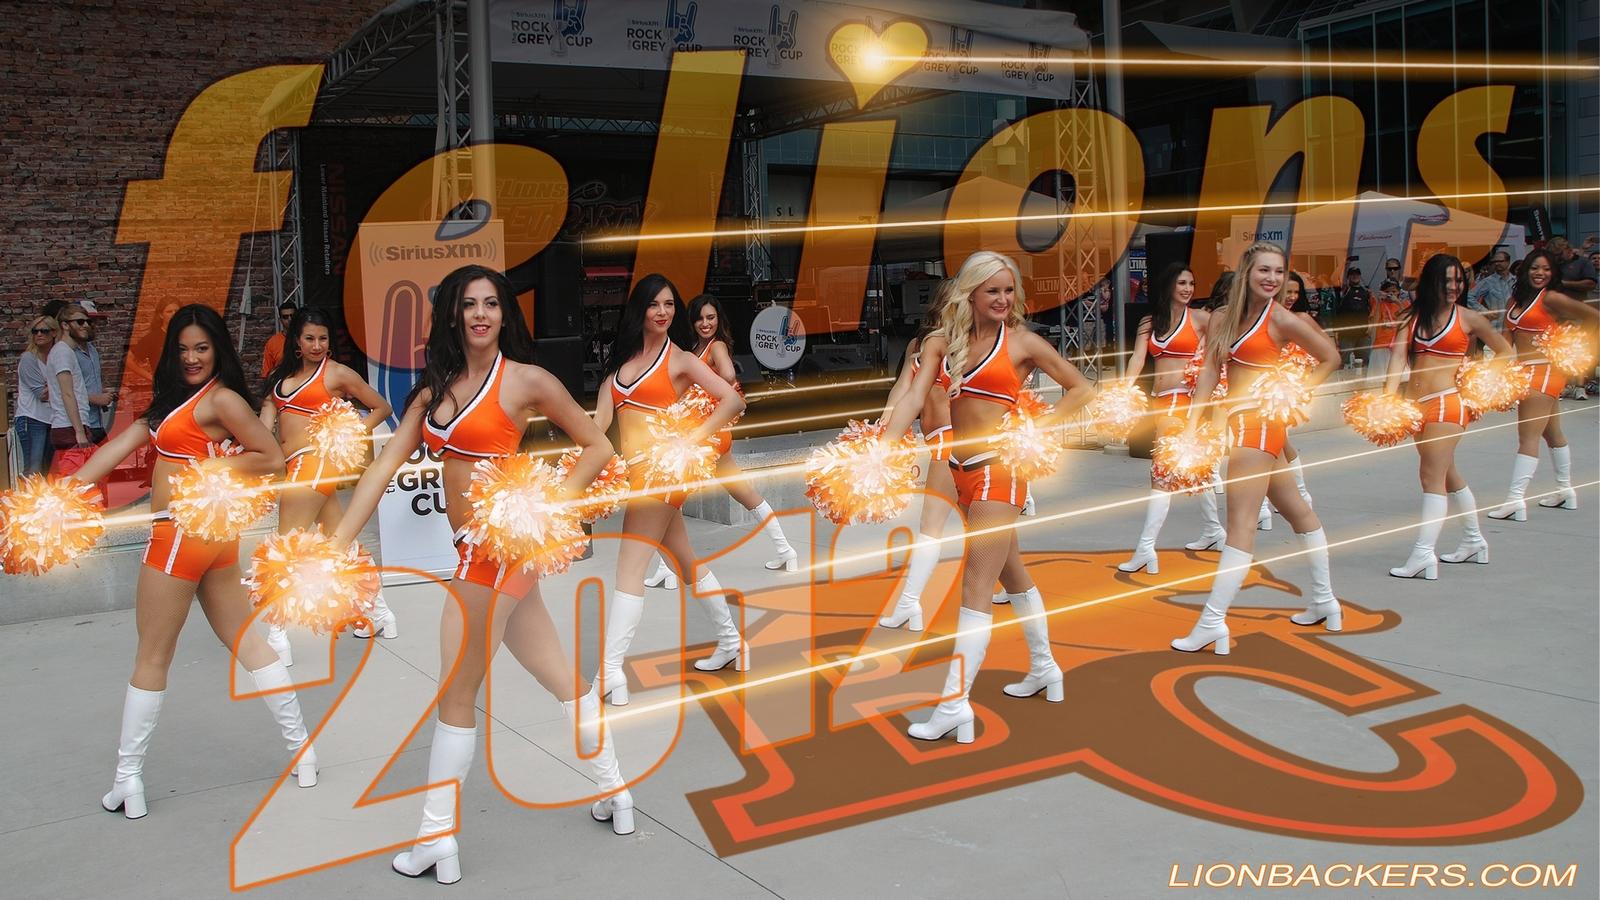 bc lions felion cheerleader wallpaper 2012 bc lions felion wallpaper 1600x900